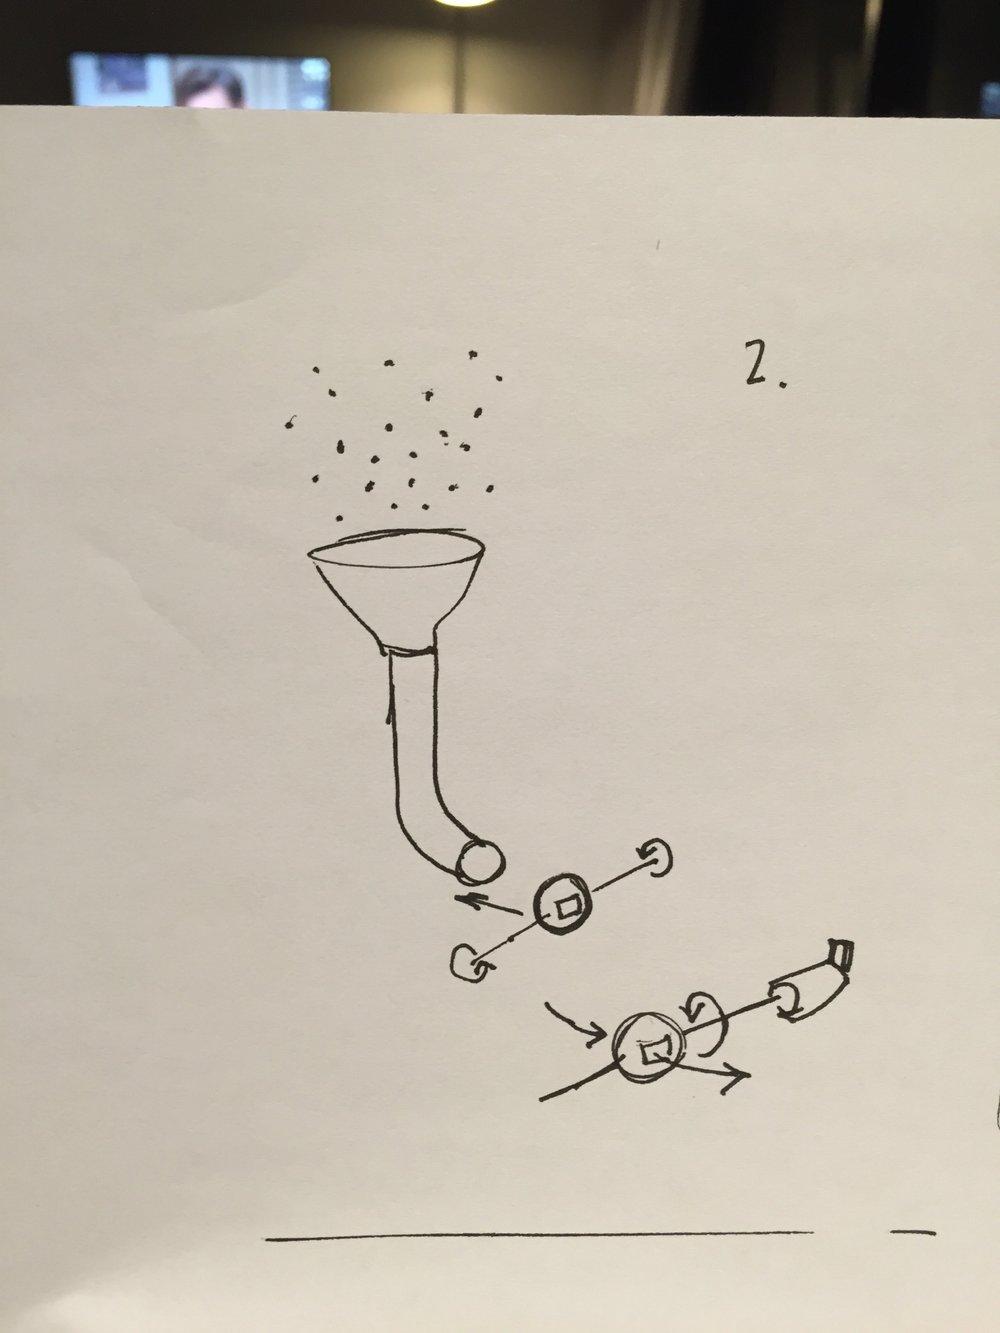 Idea 2.